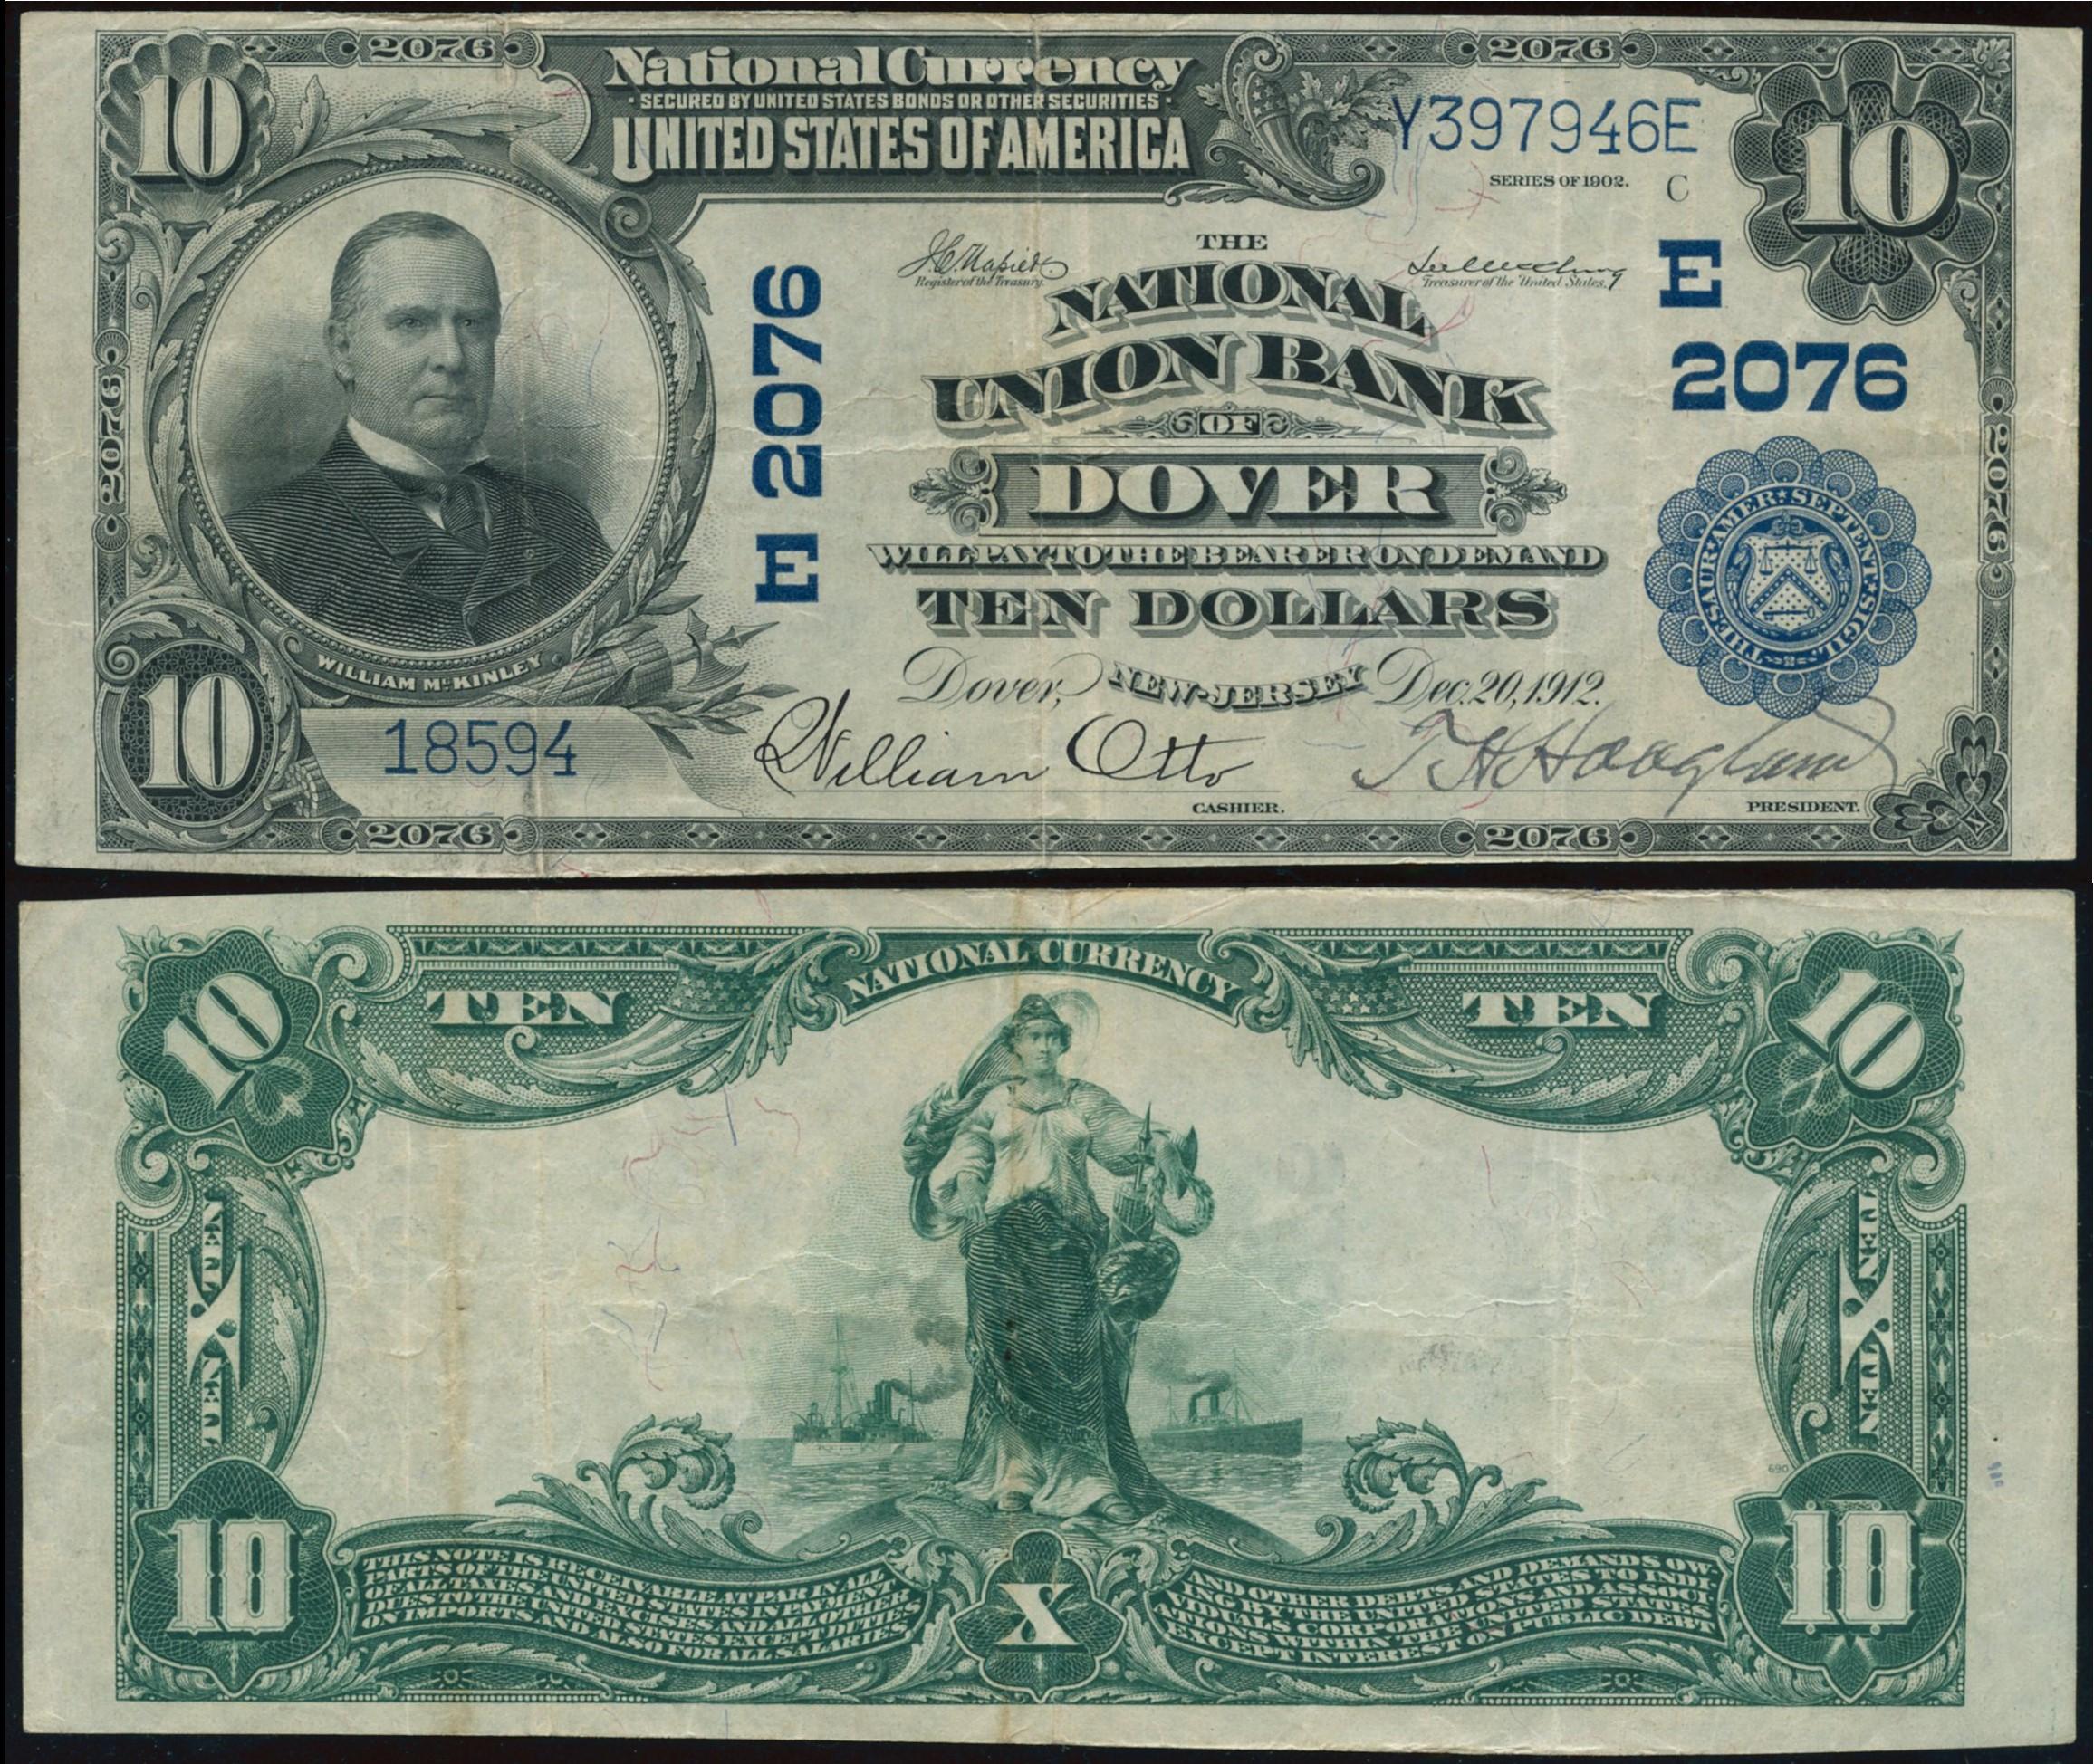 Natl Union Bank of Dover $10 02PB_18594.jpg